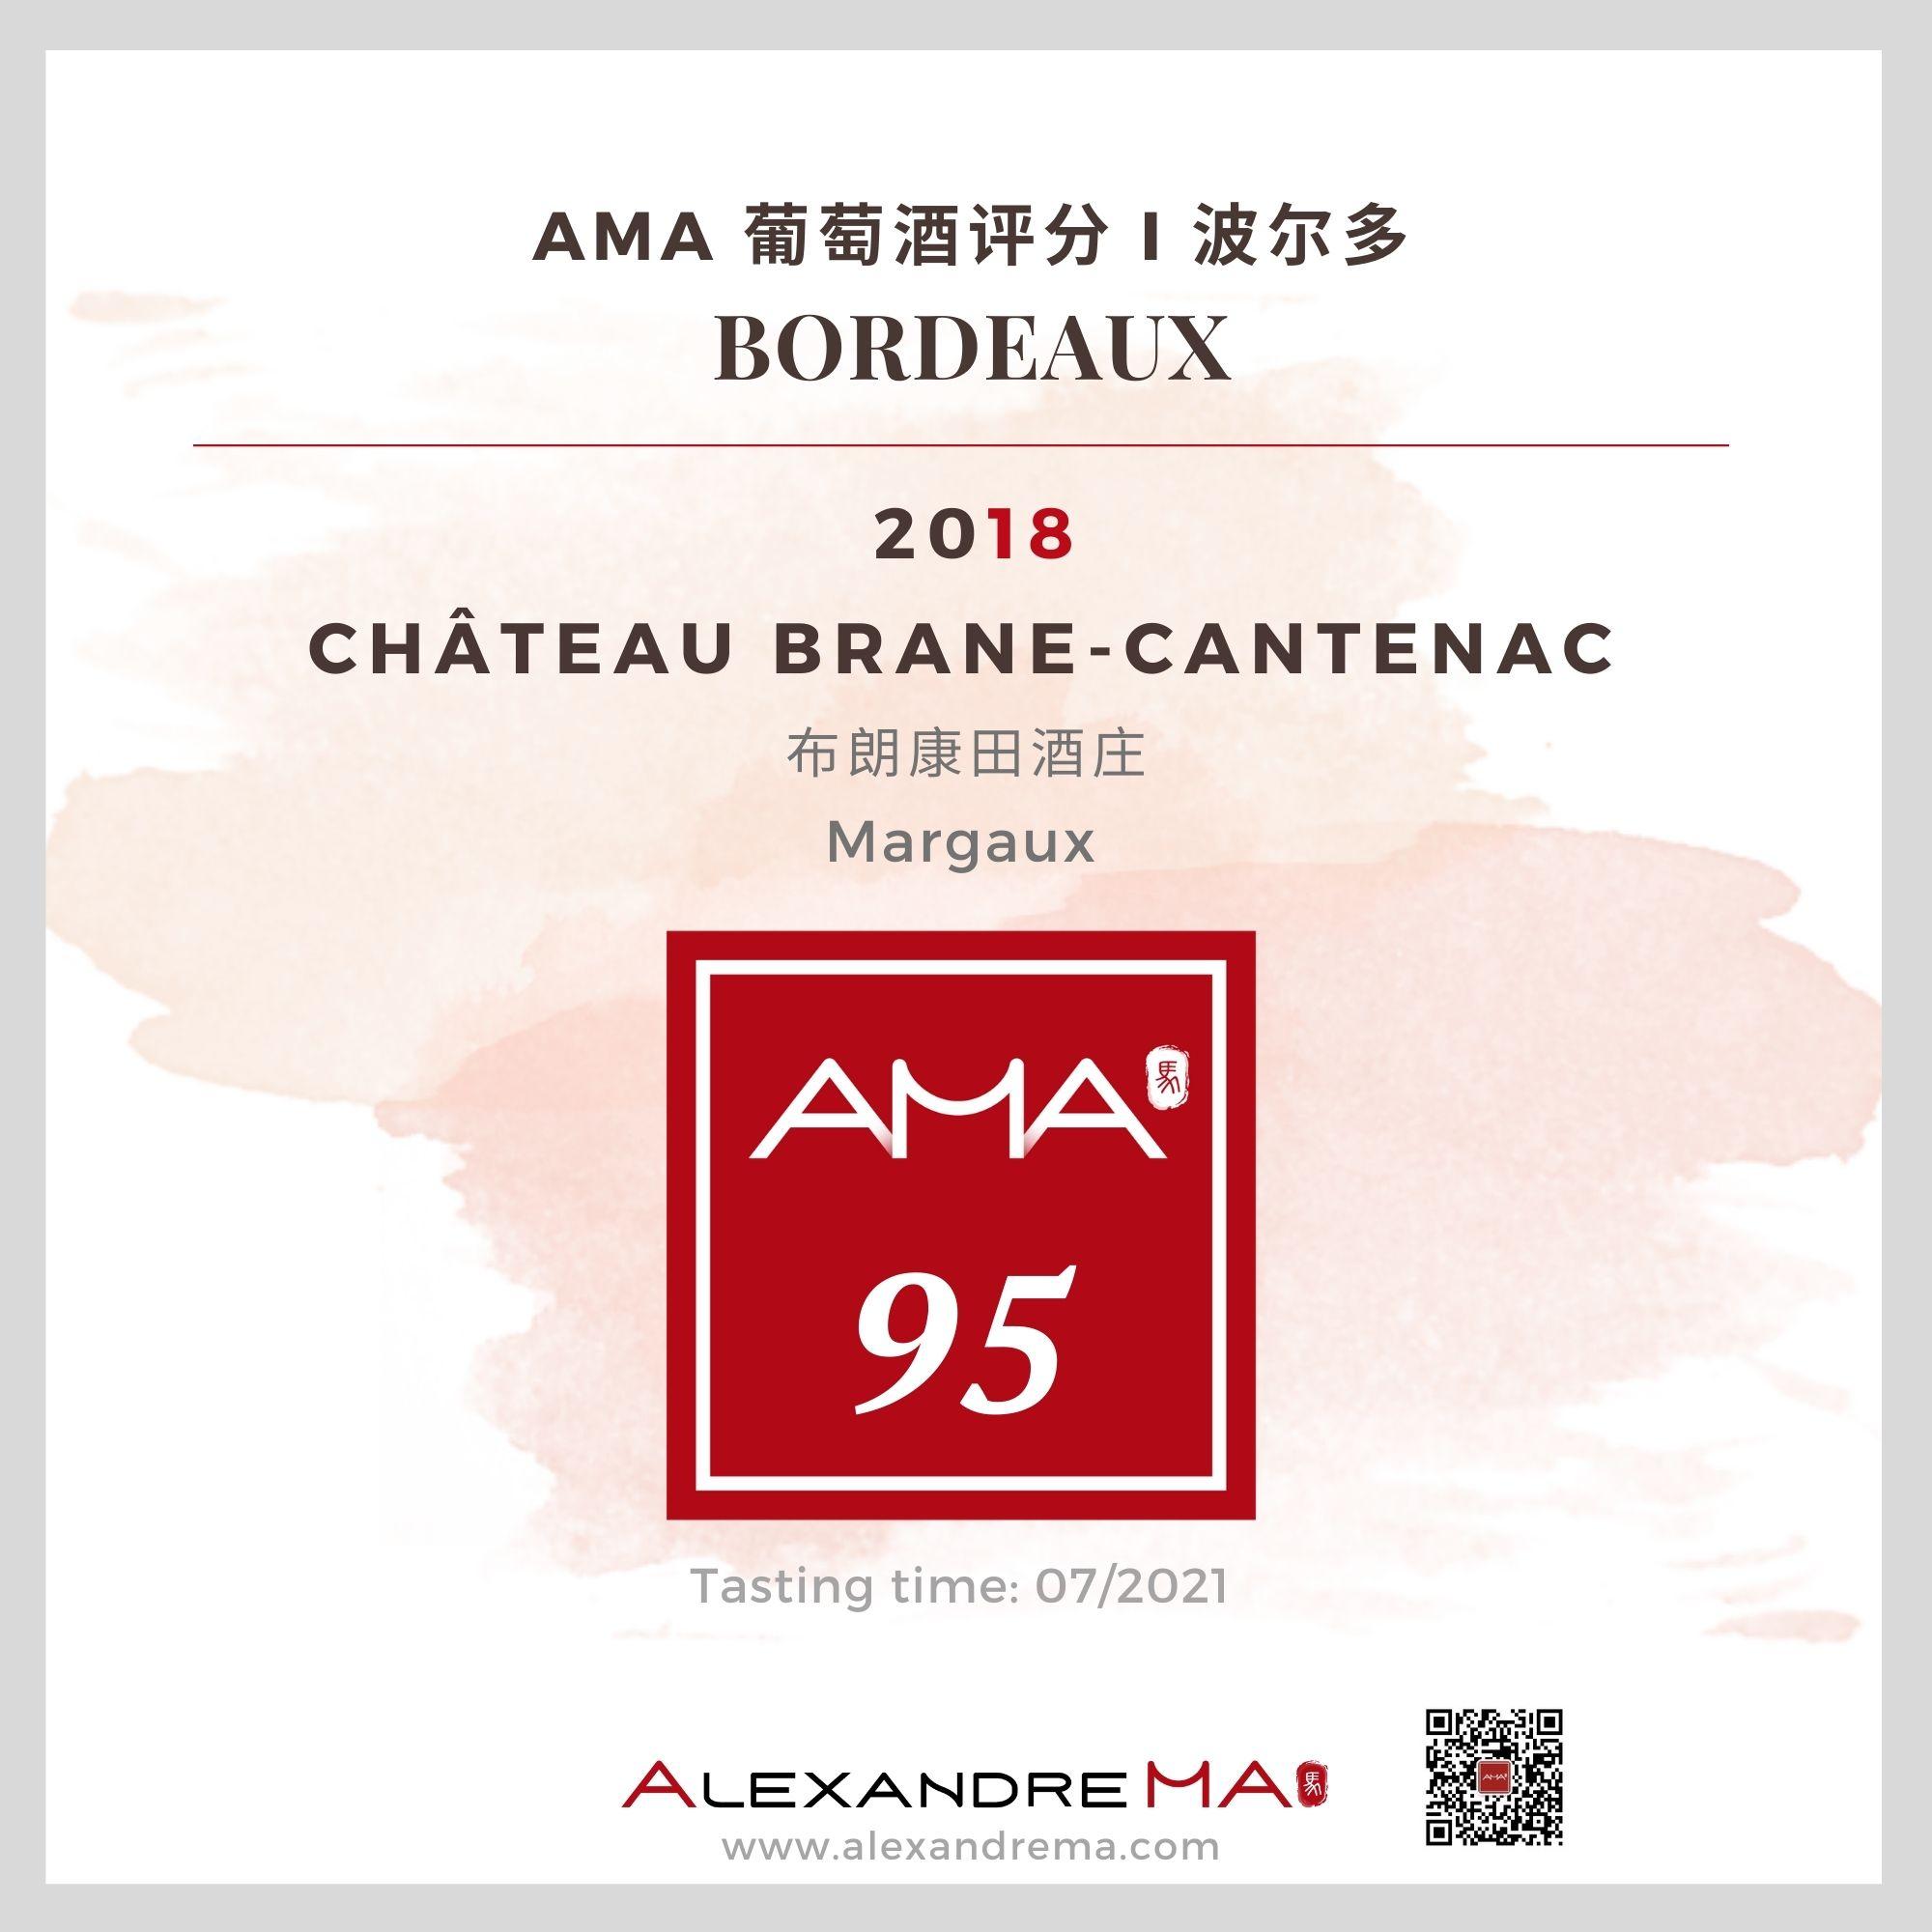 Château Brane-Cantenac 2018 布朗康田酒庄 - Alexandre Ma